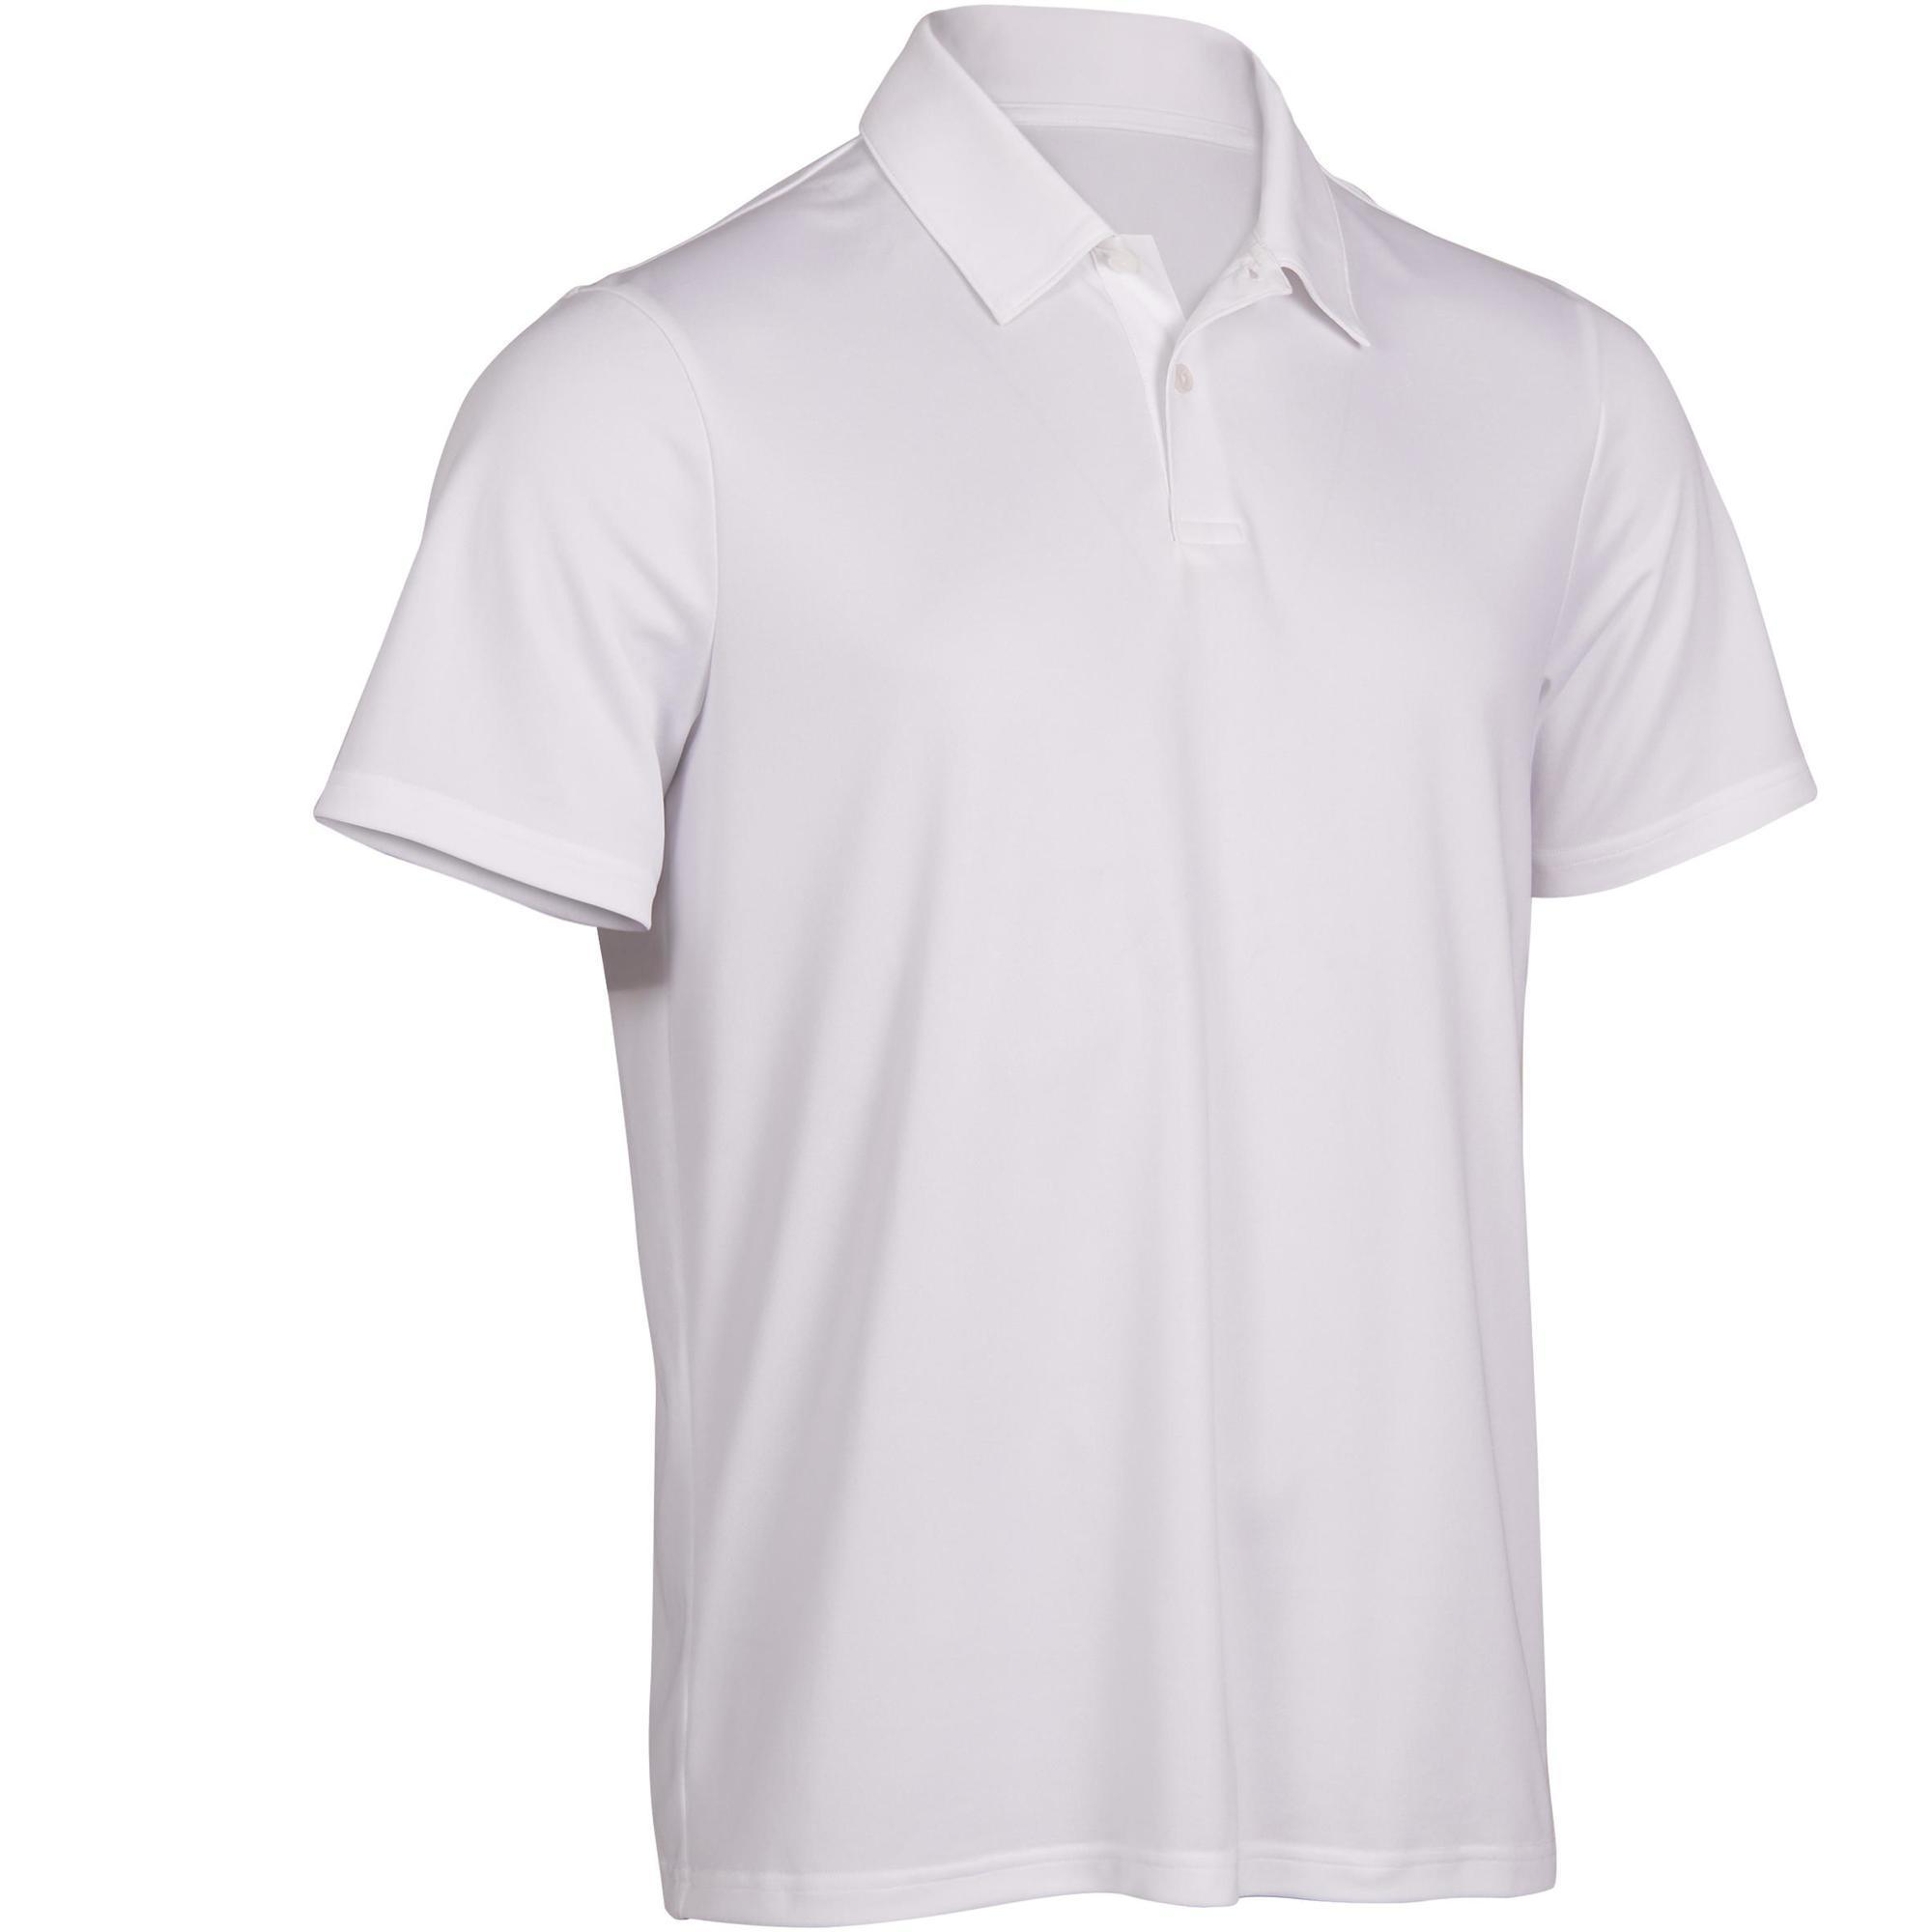 Polo tennis homme dry 100 blanc artengo